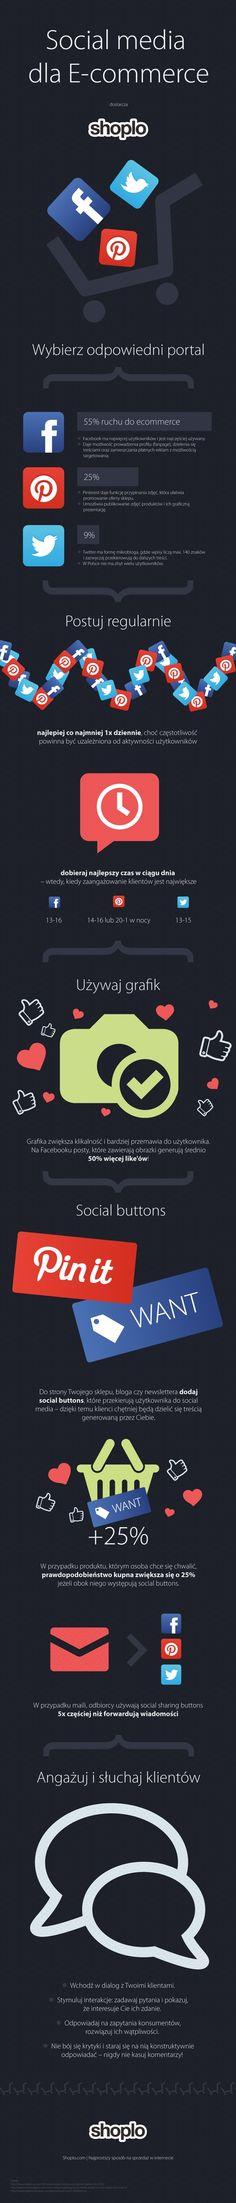 social media dla e-comerce